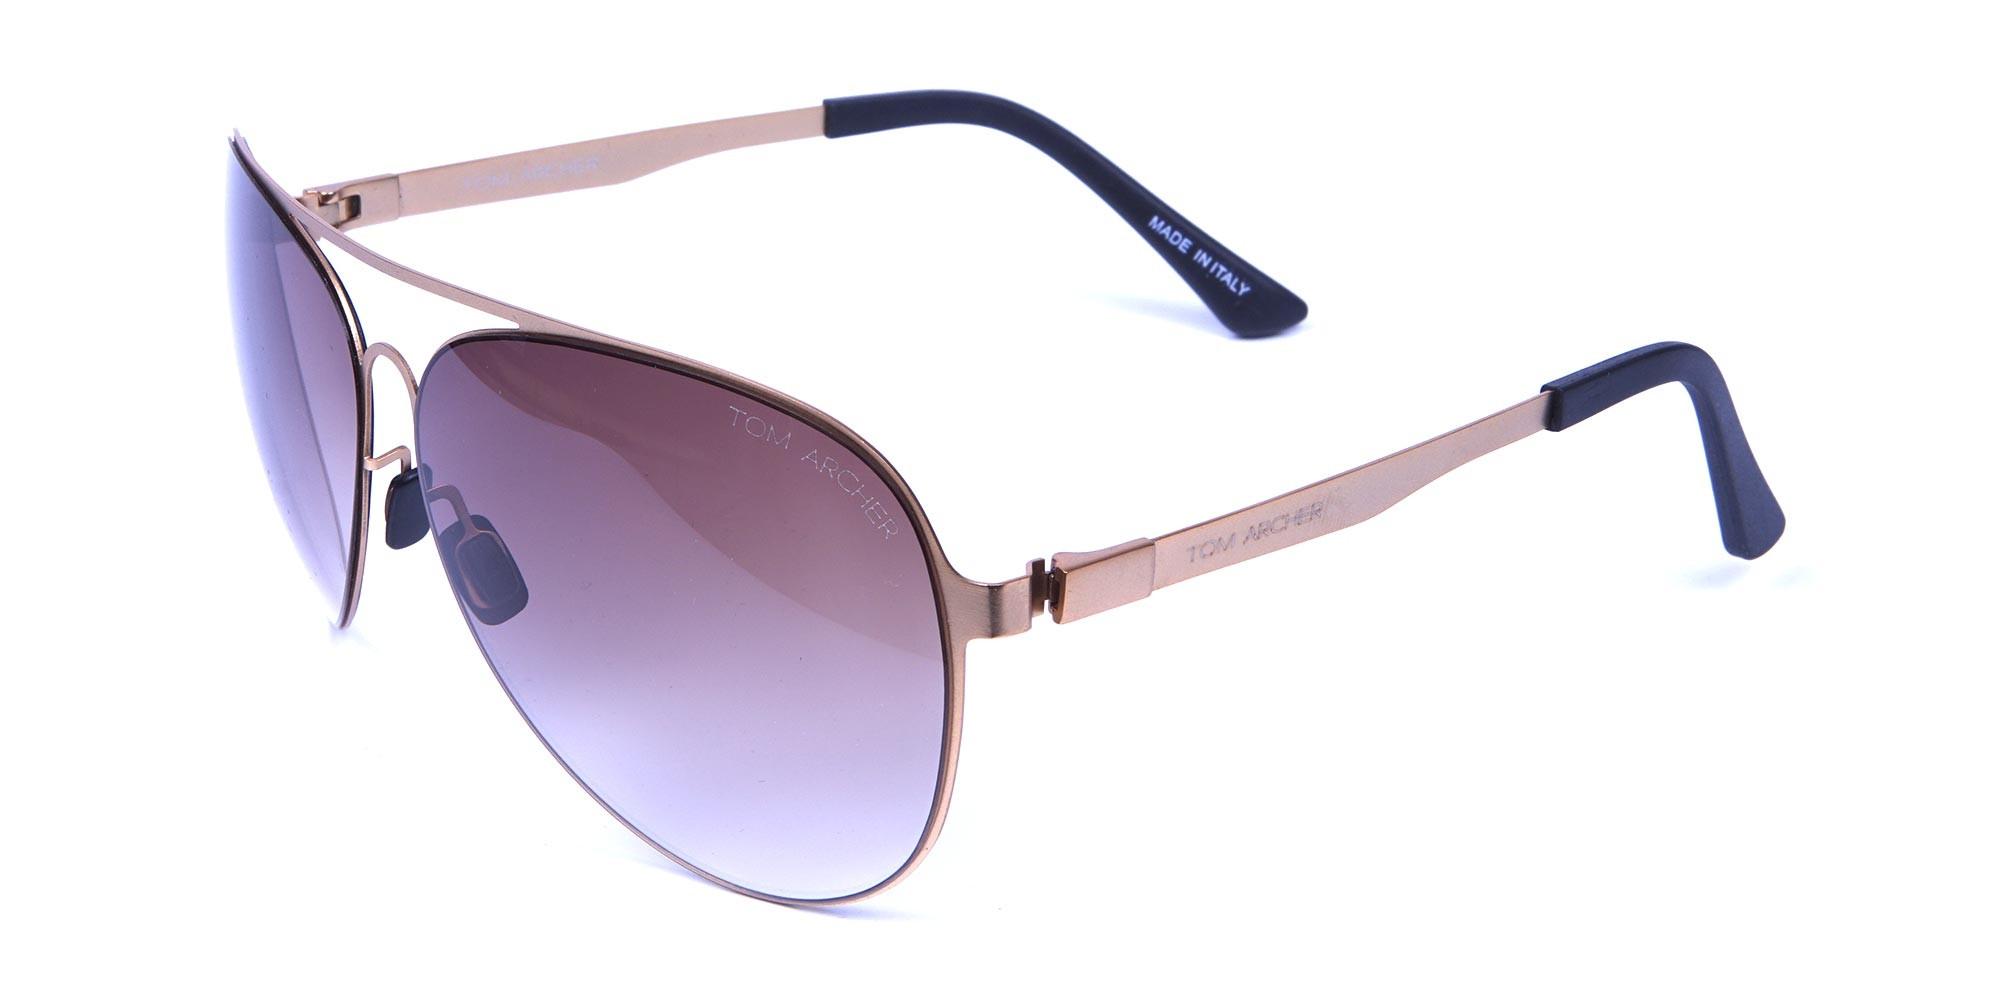 Brown & Gold Avatar Sunglasses -2